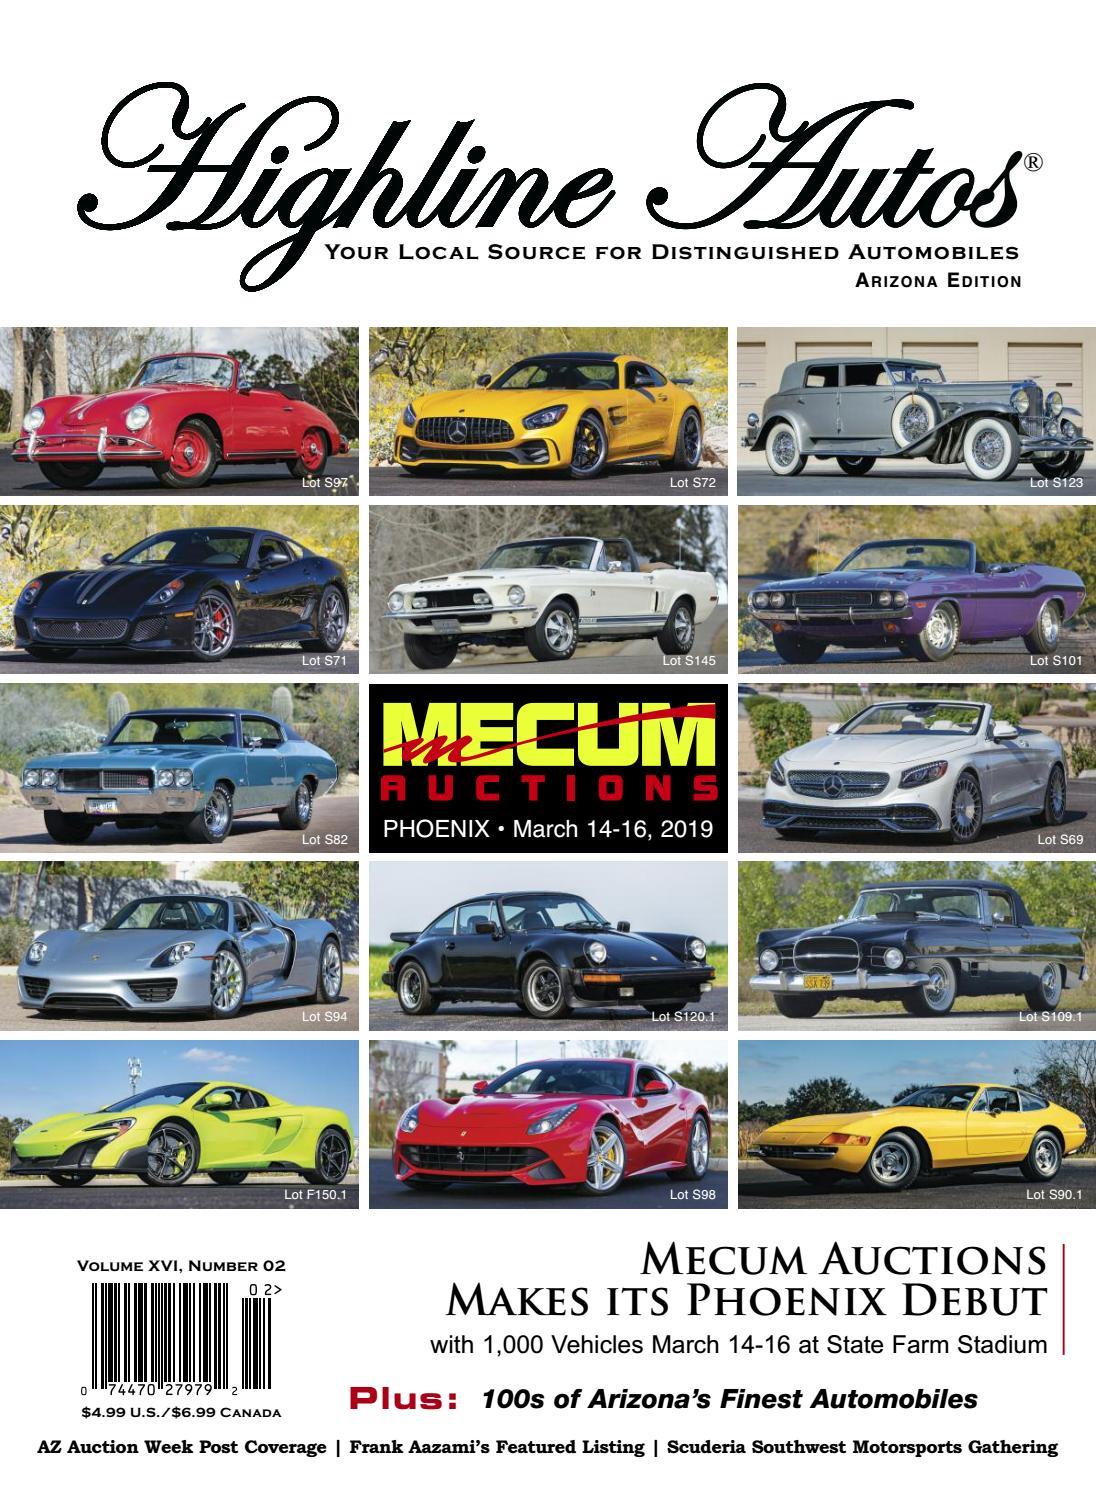 Highline Autos Volume XVI, Number 02